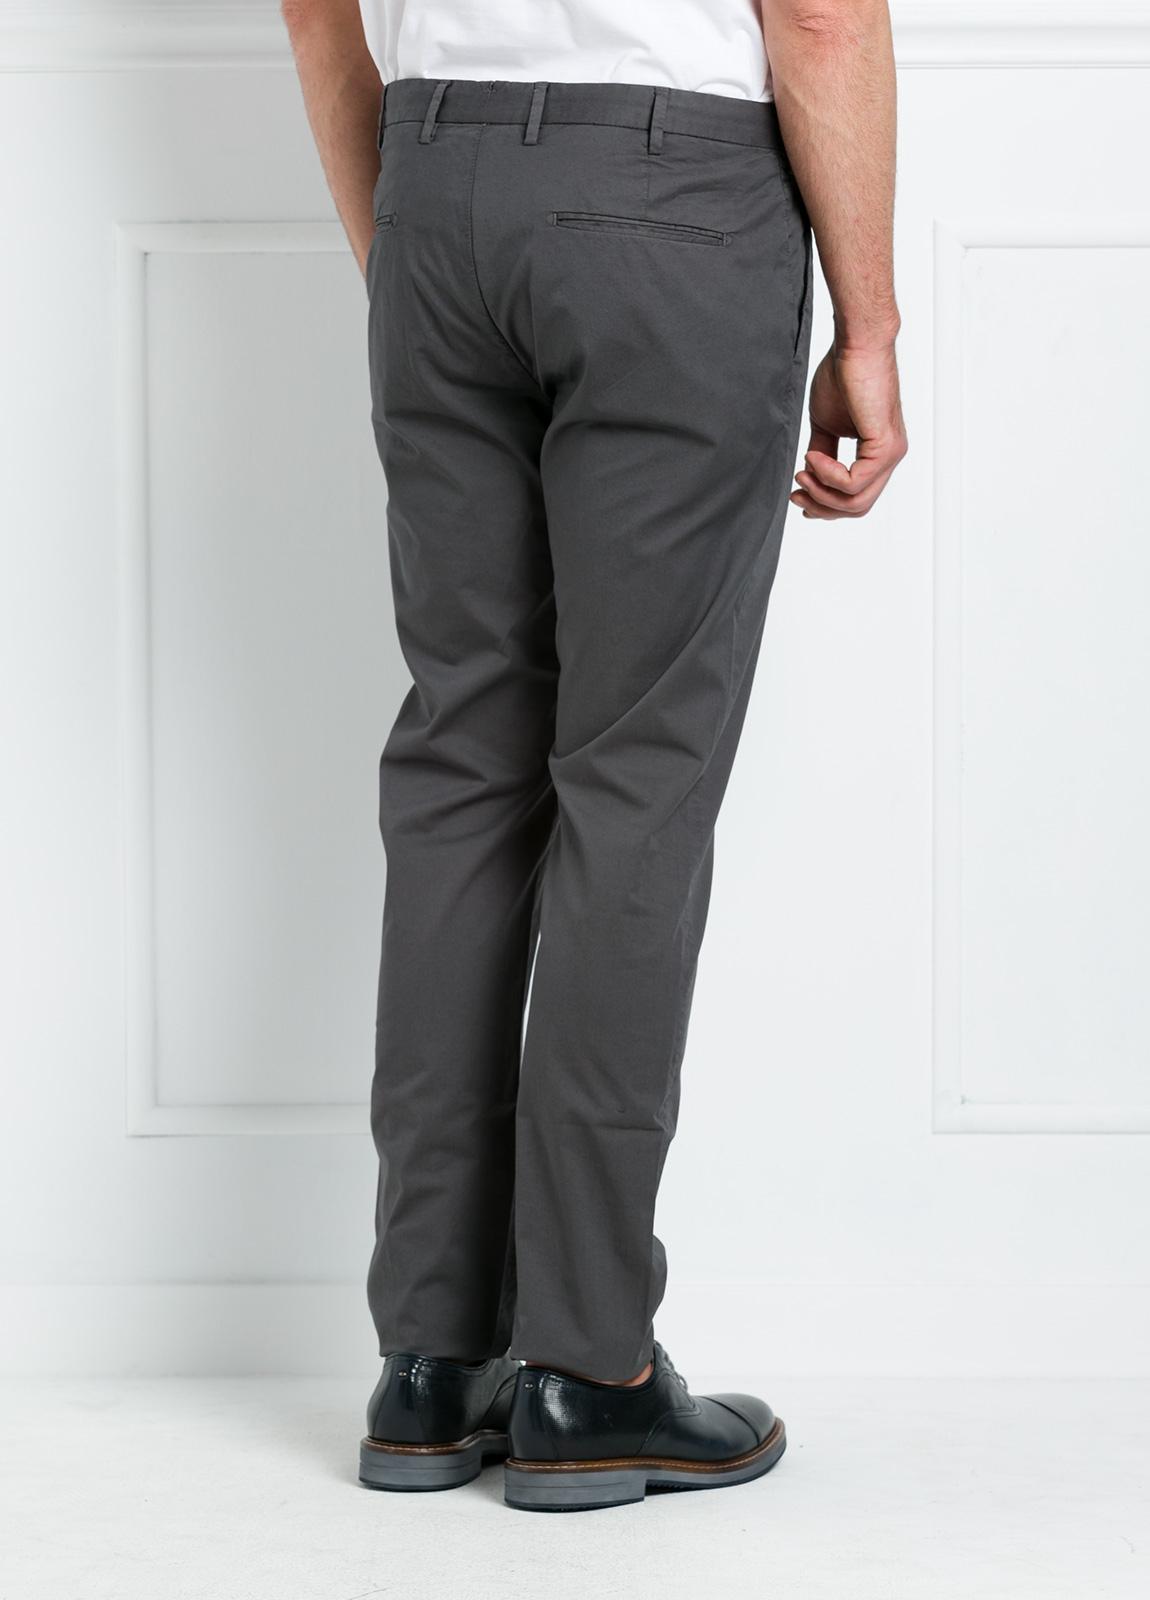 Pantalón chino REGULAR FIT modelo BRIAN color gris oscuro. 97% Algodón gabardina 3% Elastán. - Ítem3